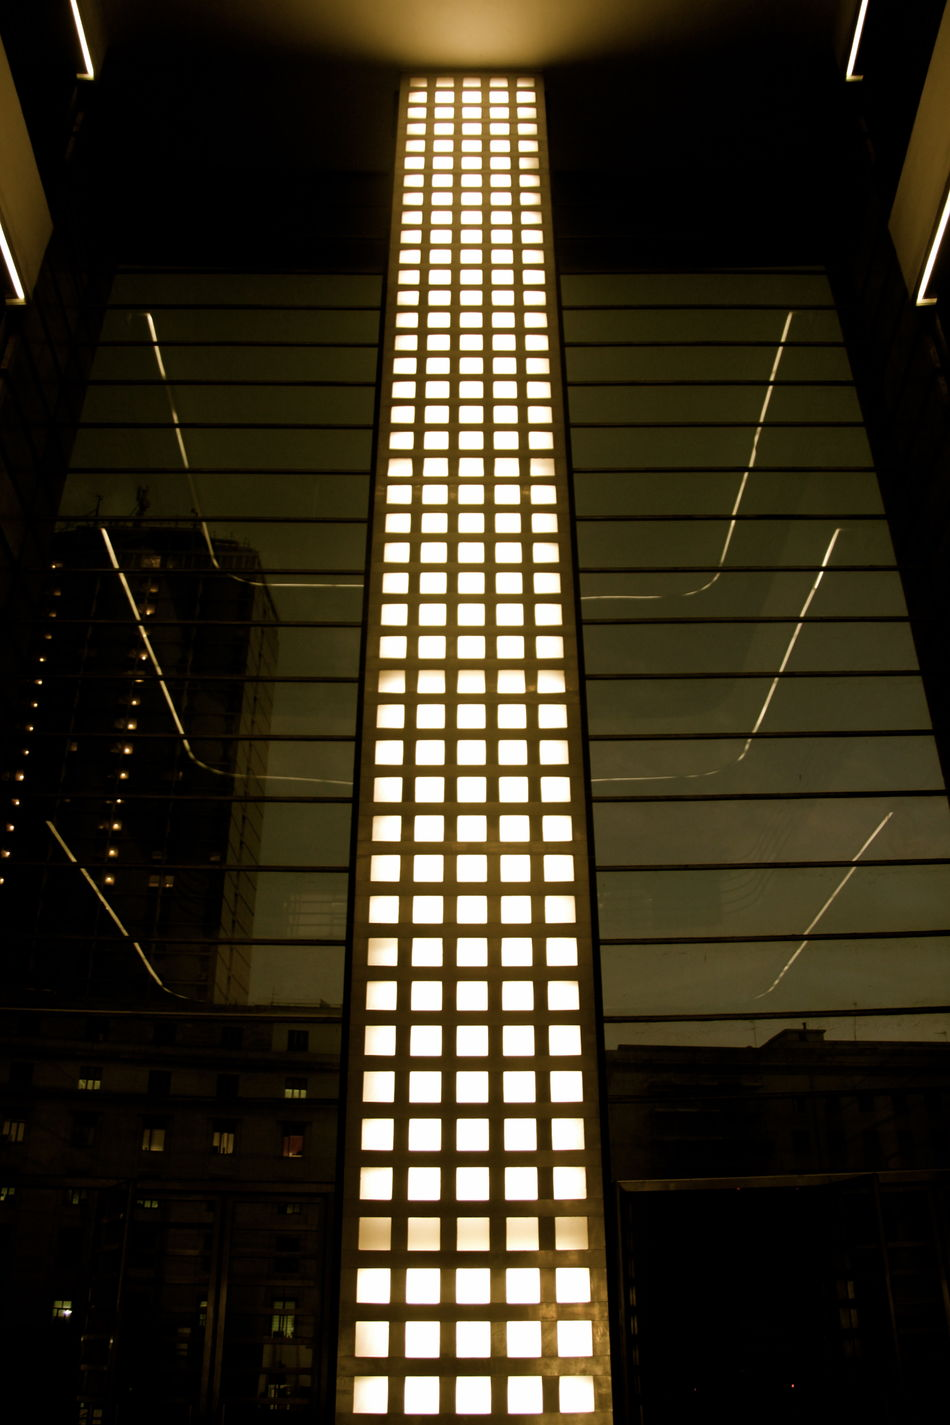 Architectural Detail Architecture Architecture Architecture_collection Fascistarchitecture Illuminated Indoors  Light Monochrome Monochrome Photography No People Post Office Rationalism Razionalismo Ventennio